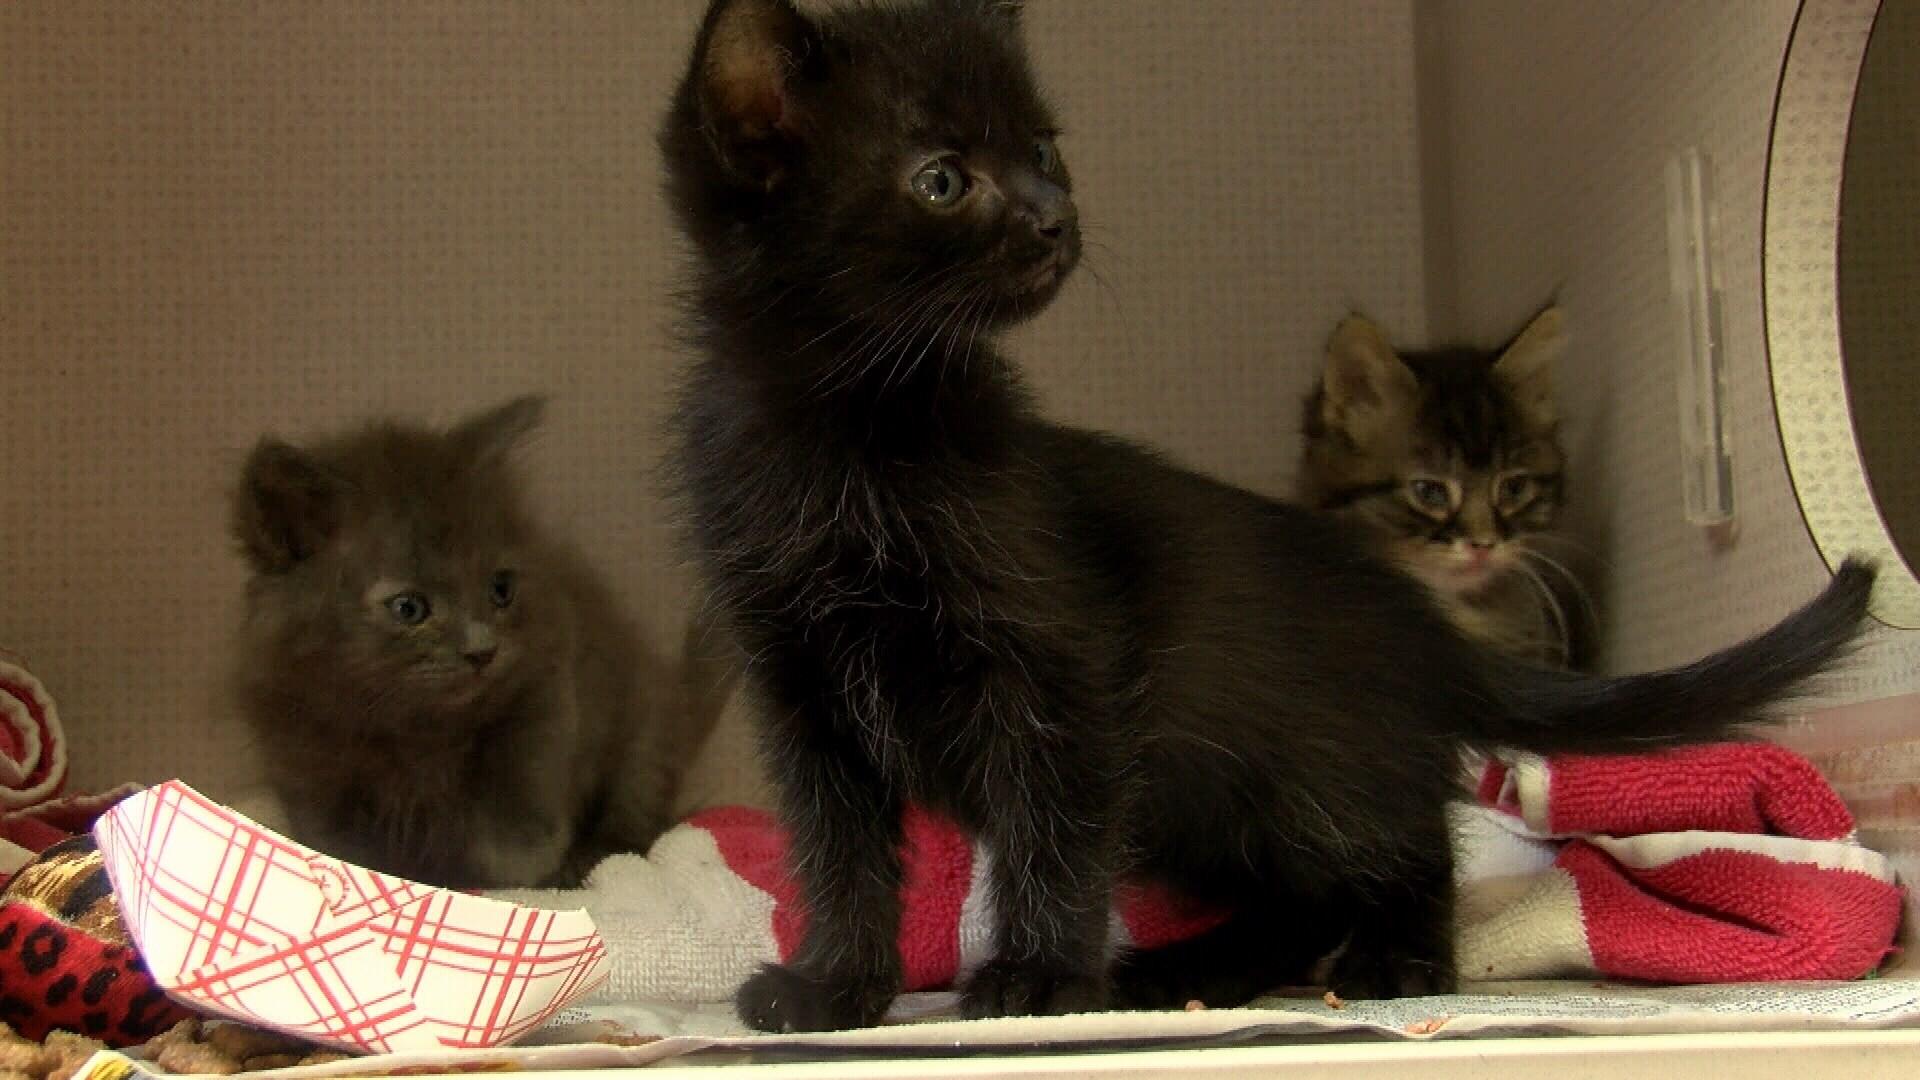 Kittens at San Luis Obispo County Animal Services. (KSBY photo)